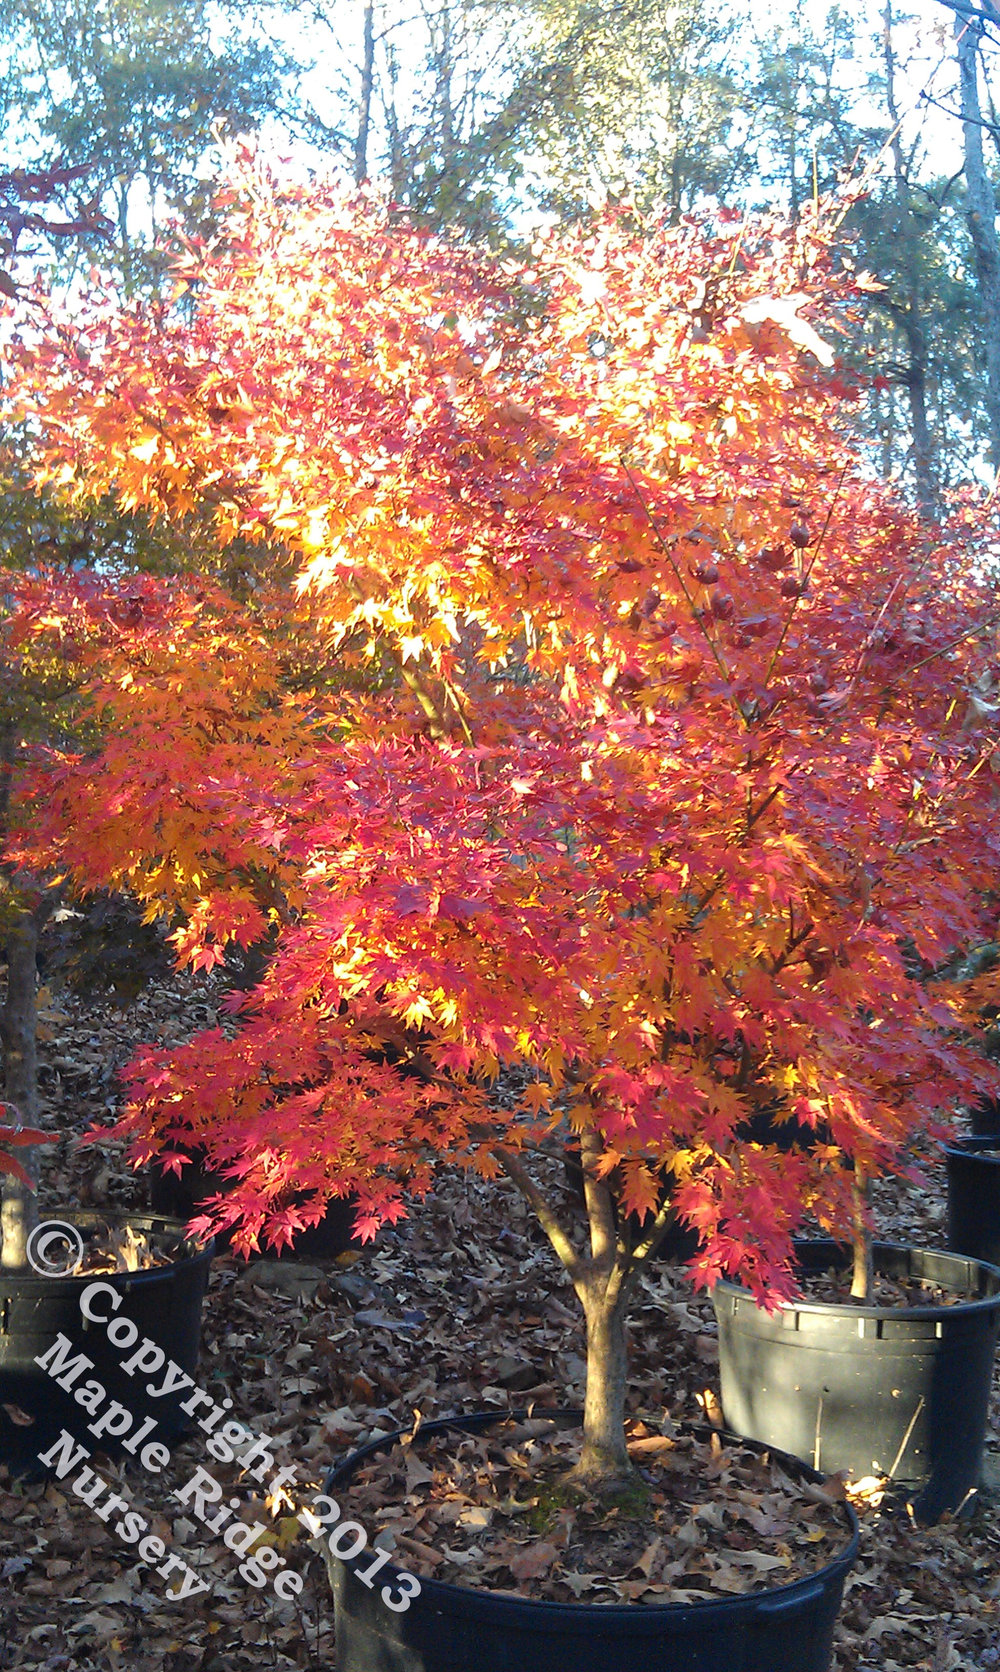 Acer_palmatum_Tobiosho_November_2012_Maple_Ridge_Nursery_1.jpg